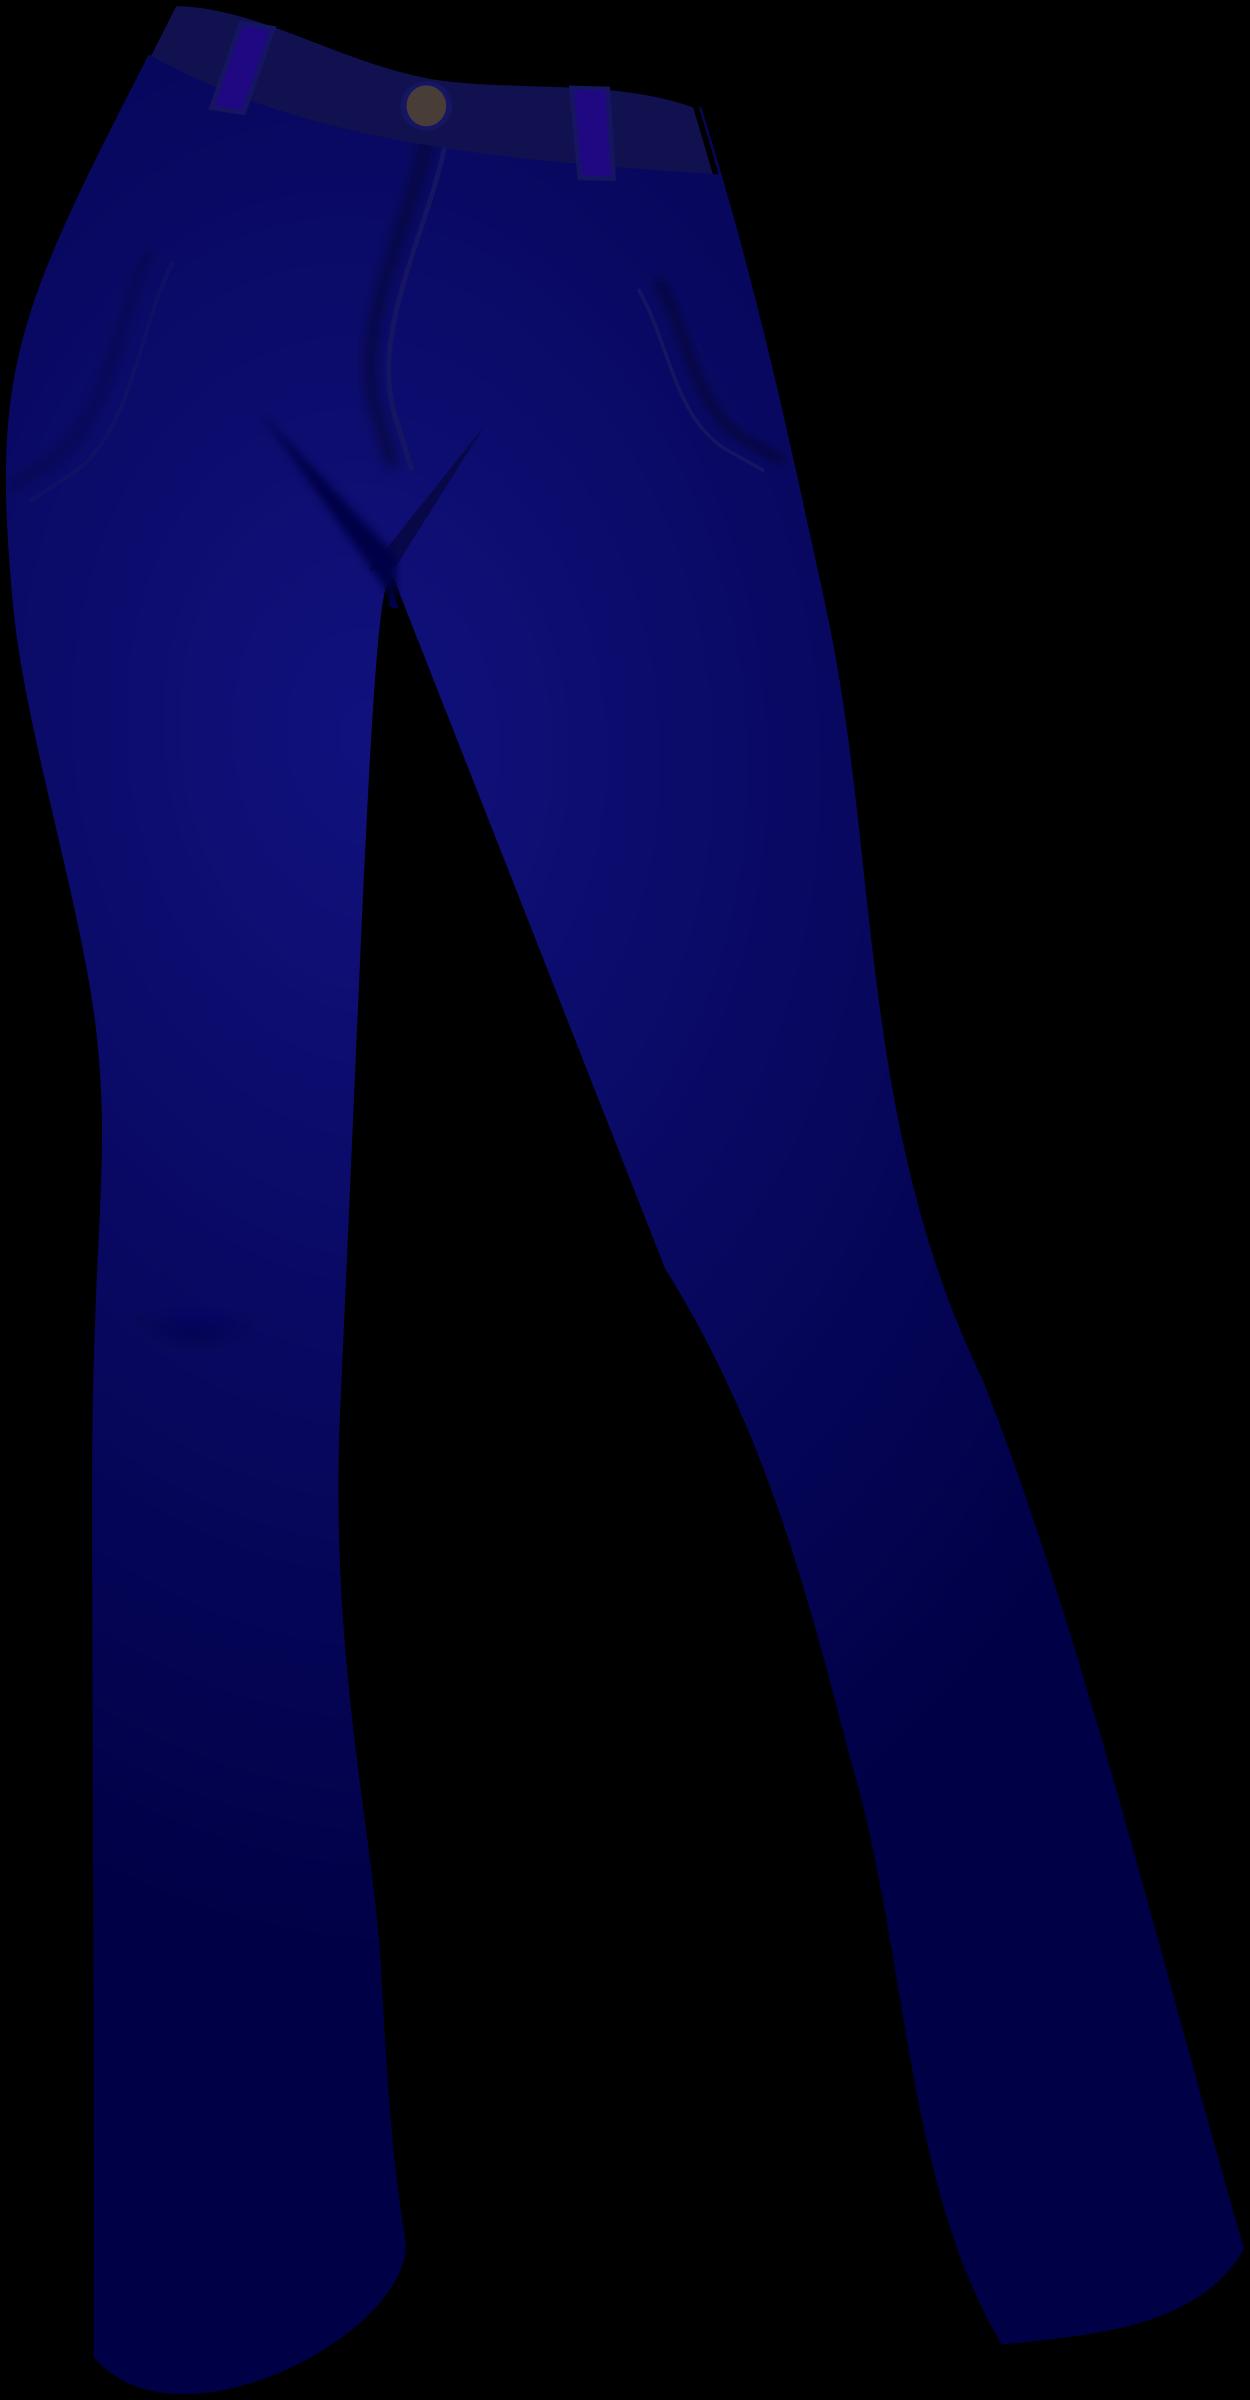 Grandpa clipart jeans shirt. Dancing blue jean